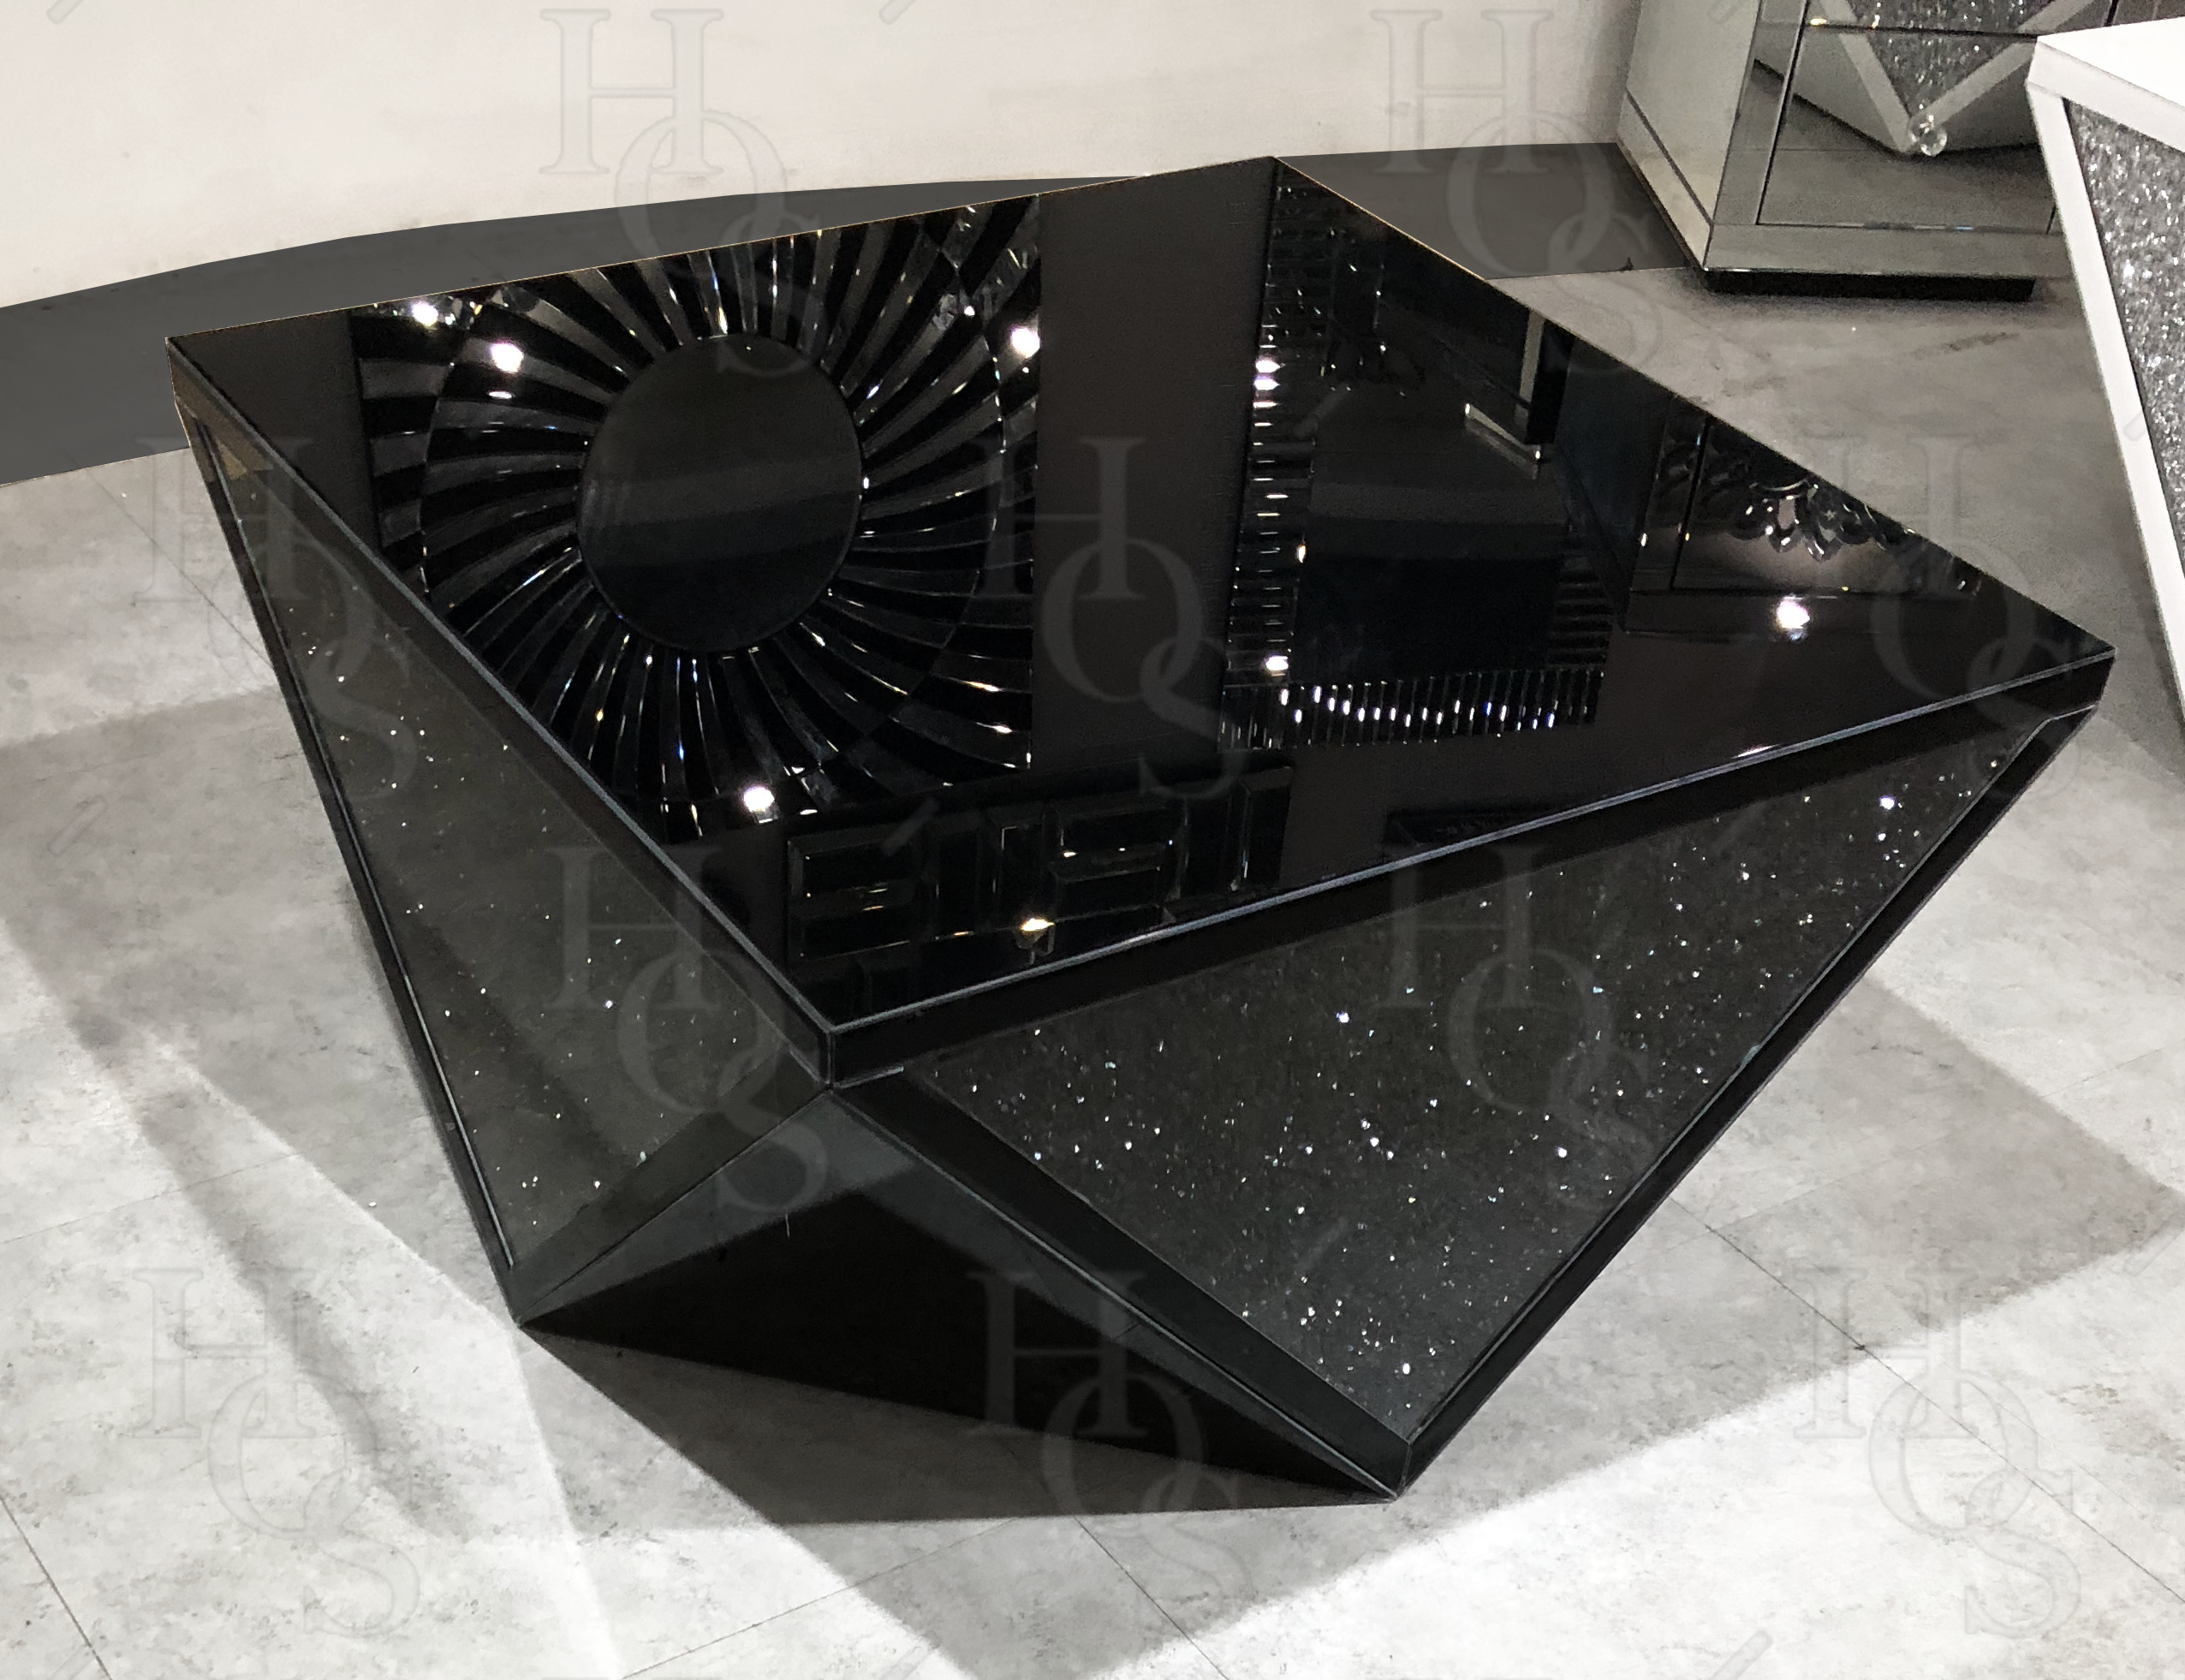 Black Mirror Crush Exclusive Coffee Table Mirrored Furniture Sparkle Diamond House Of Spa Decor Interior Design Mirrored Furniture Decor Luxury Furniture [ 1962 x 2552 Pixel ]